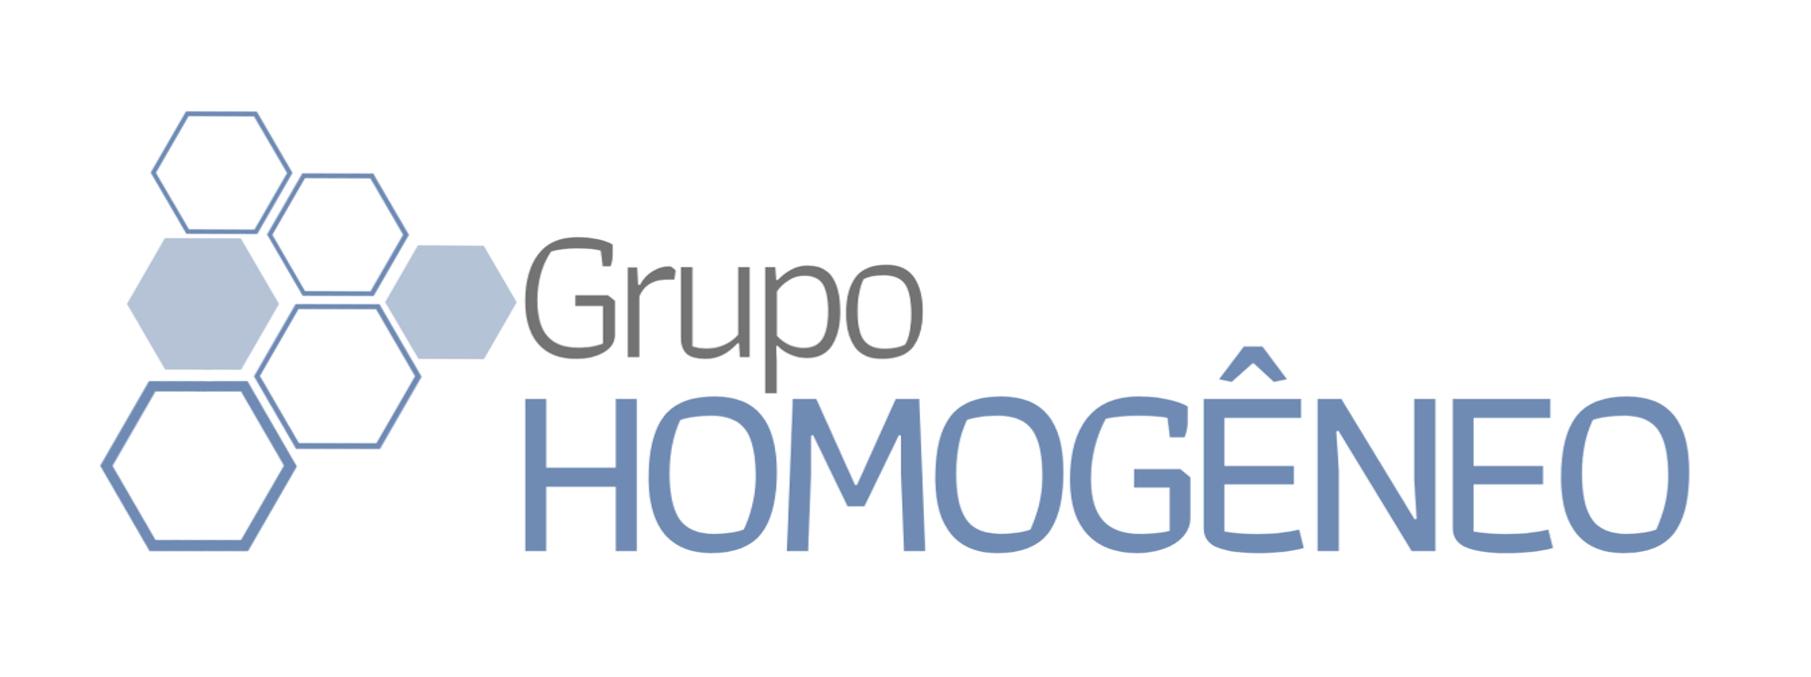 Grupo Homogêneo - Fone (11) 4177-5171